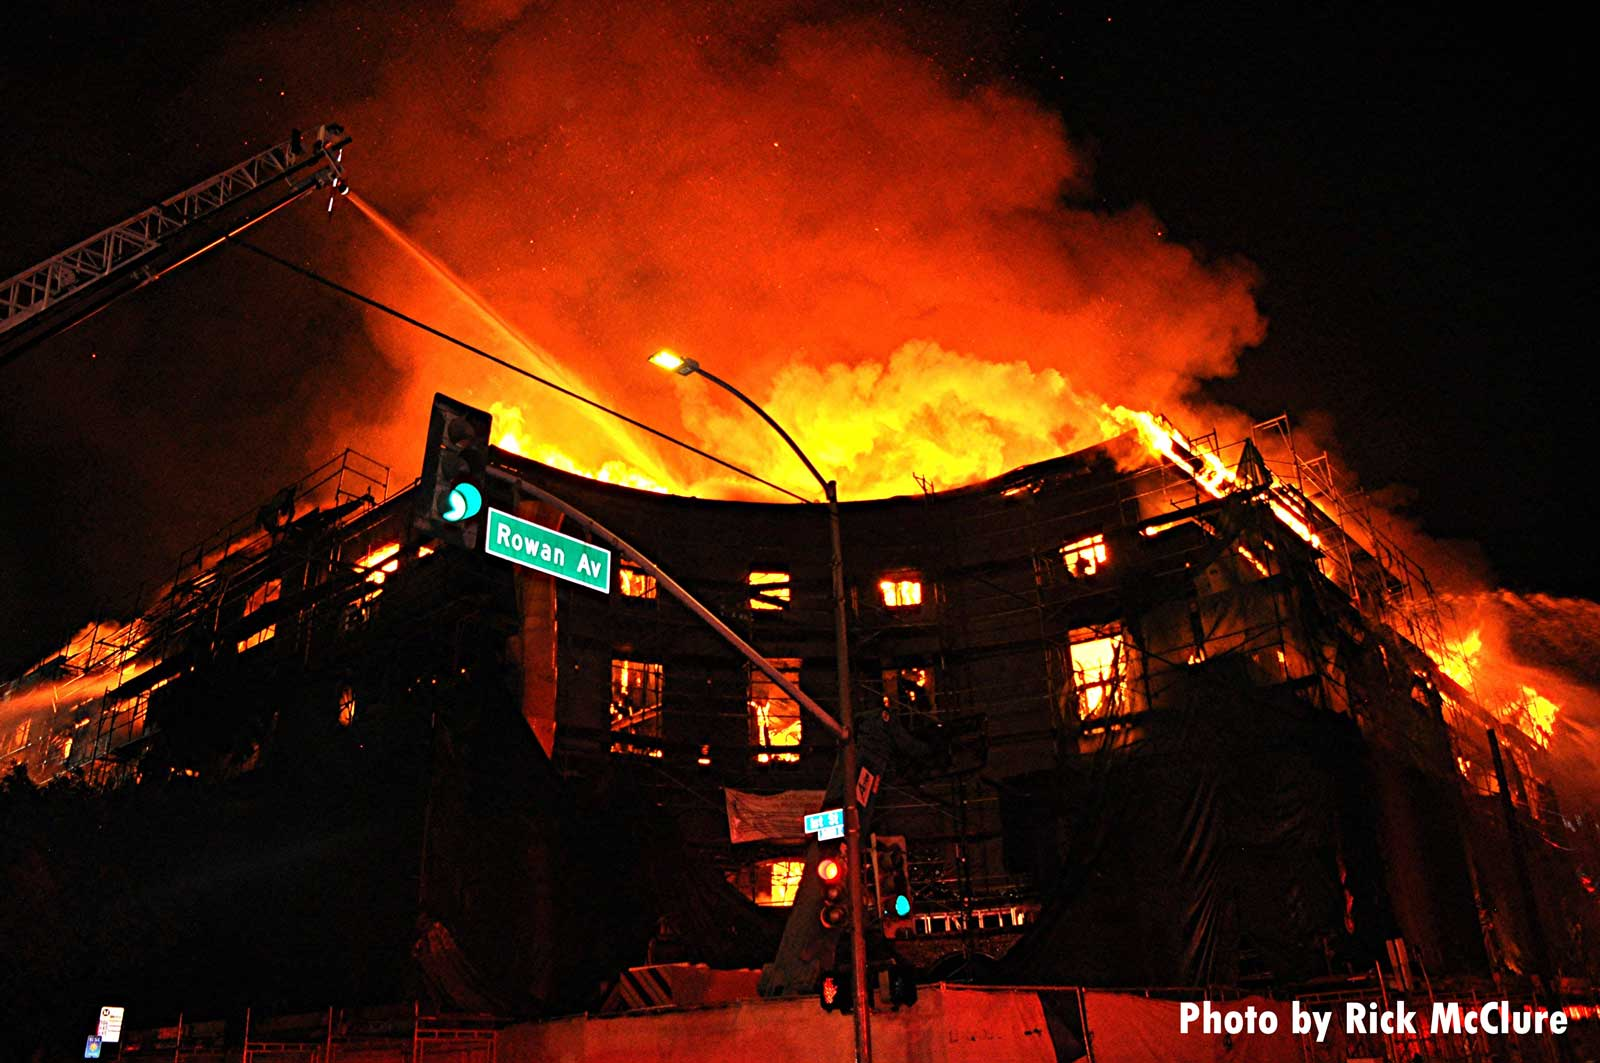 Massive fire in East L.A. housing complex